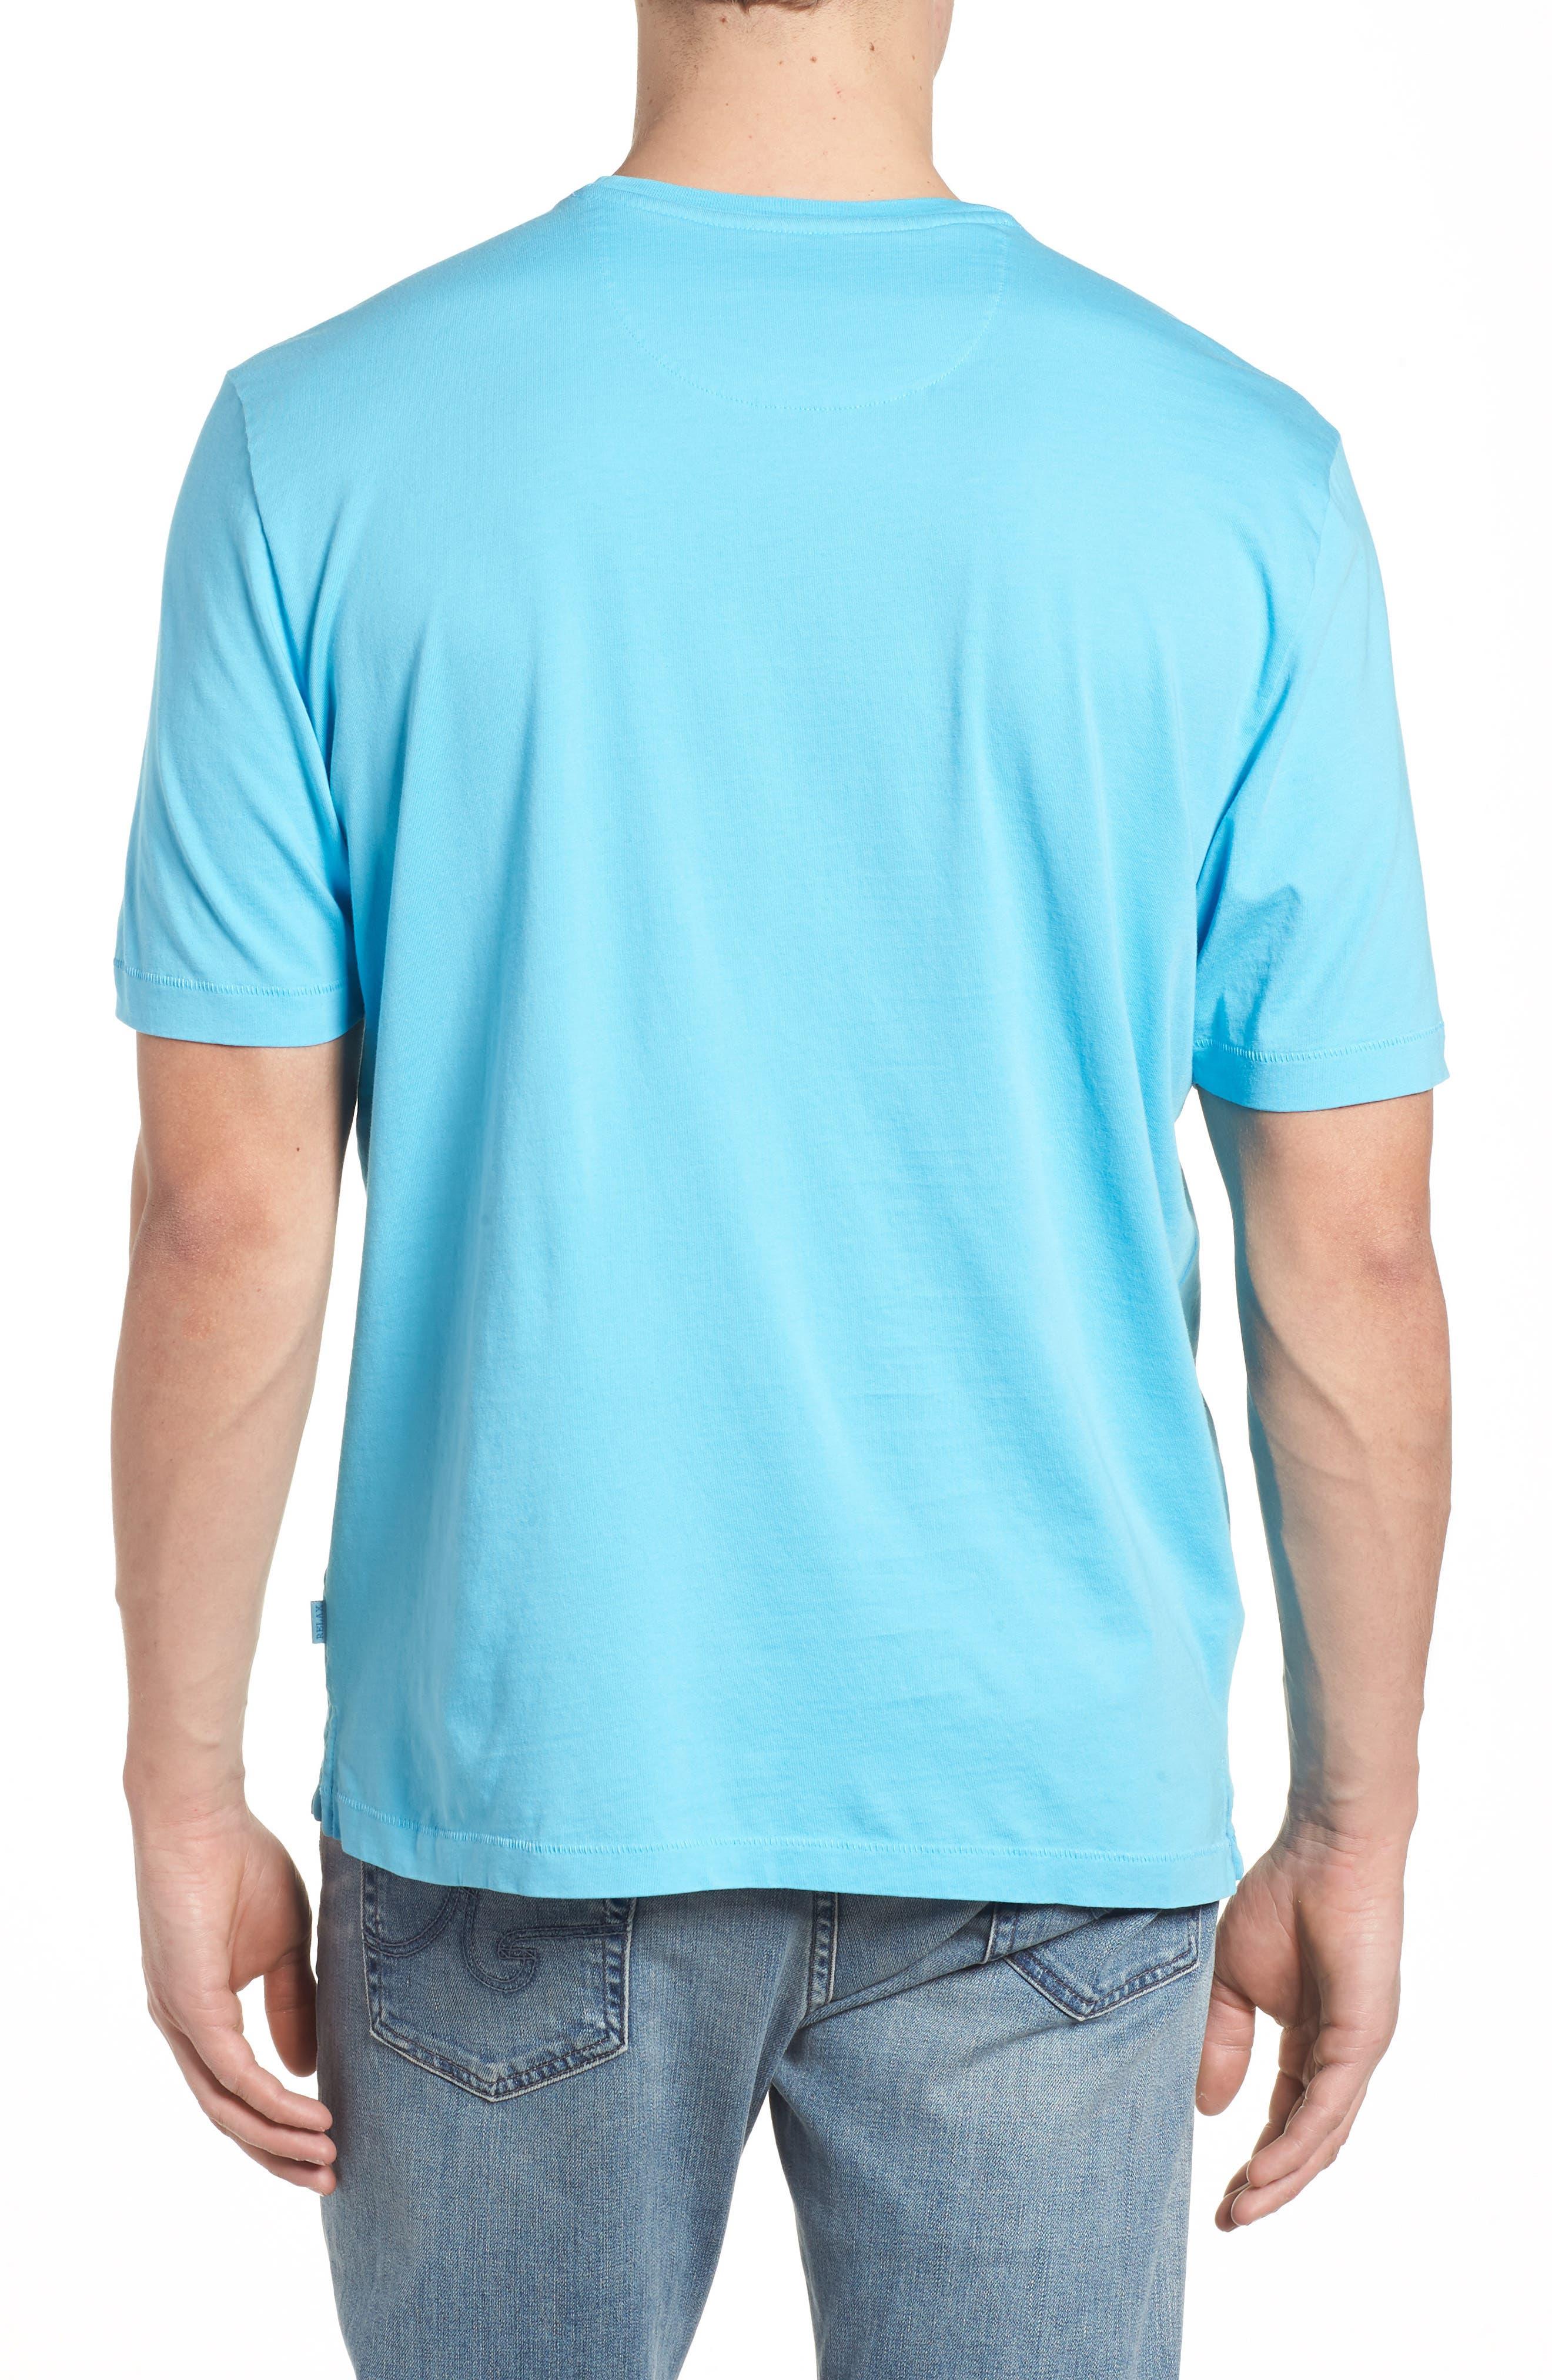 Bali Skyline T-Shirt,                             Alternate thumbnail 2, color,                             Breeze Blue